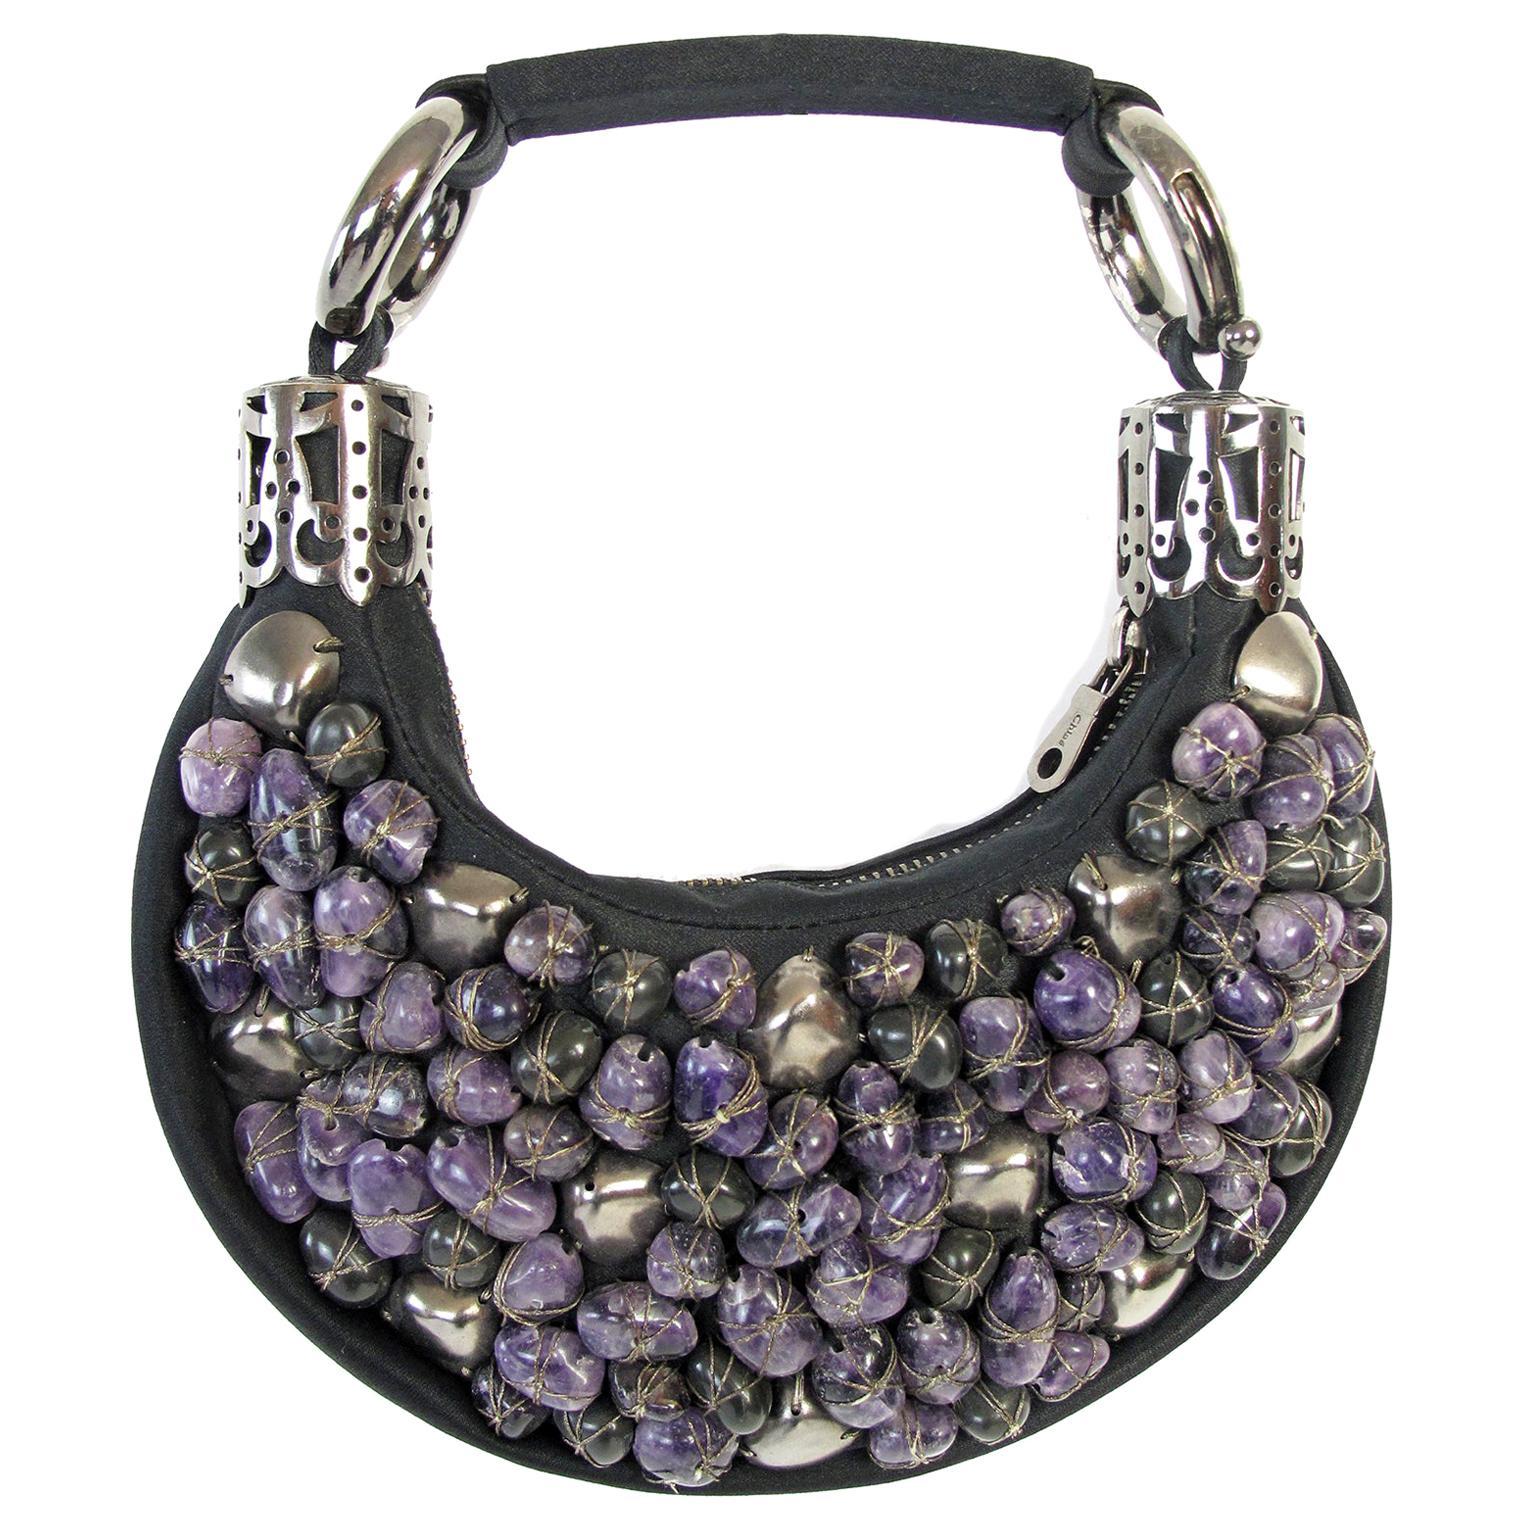 Chloe Black Satin Mini Bag with Stone Embellishments Phoebe Philo